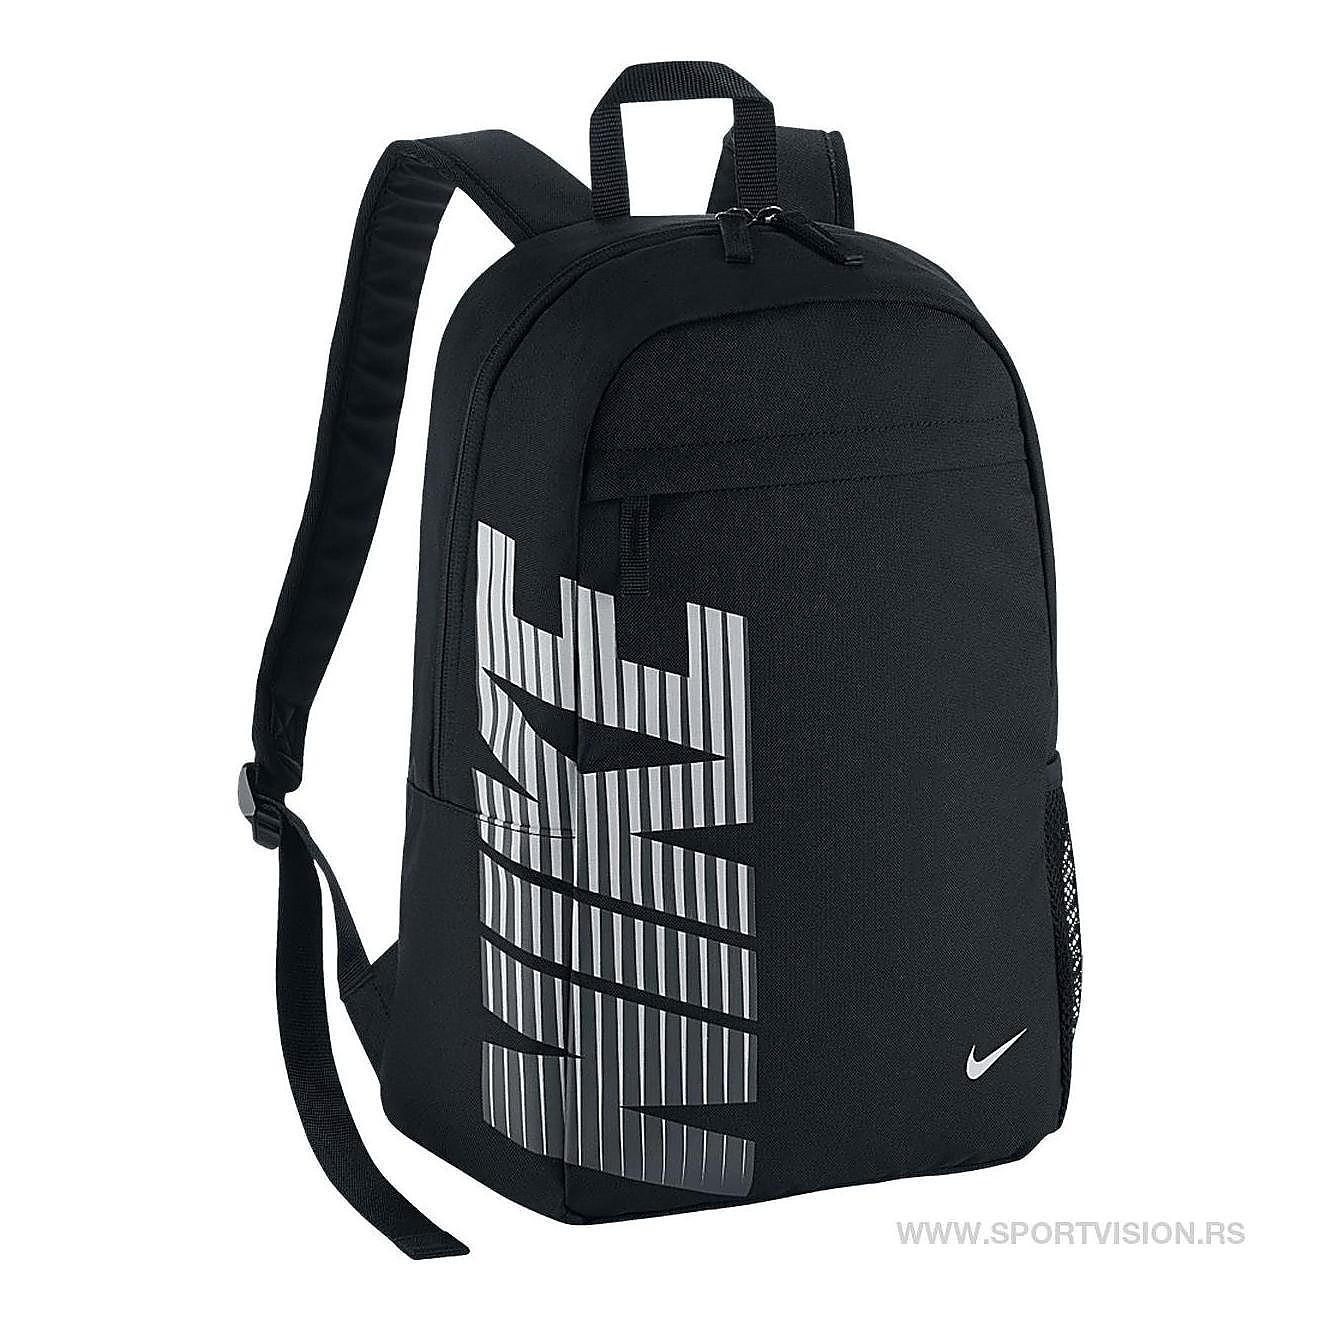 Nike CLASSIC SAND RUGTAS